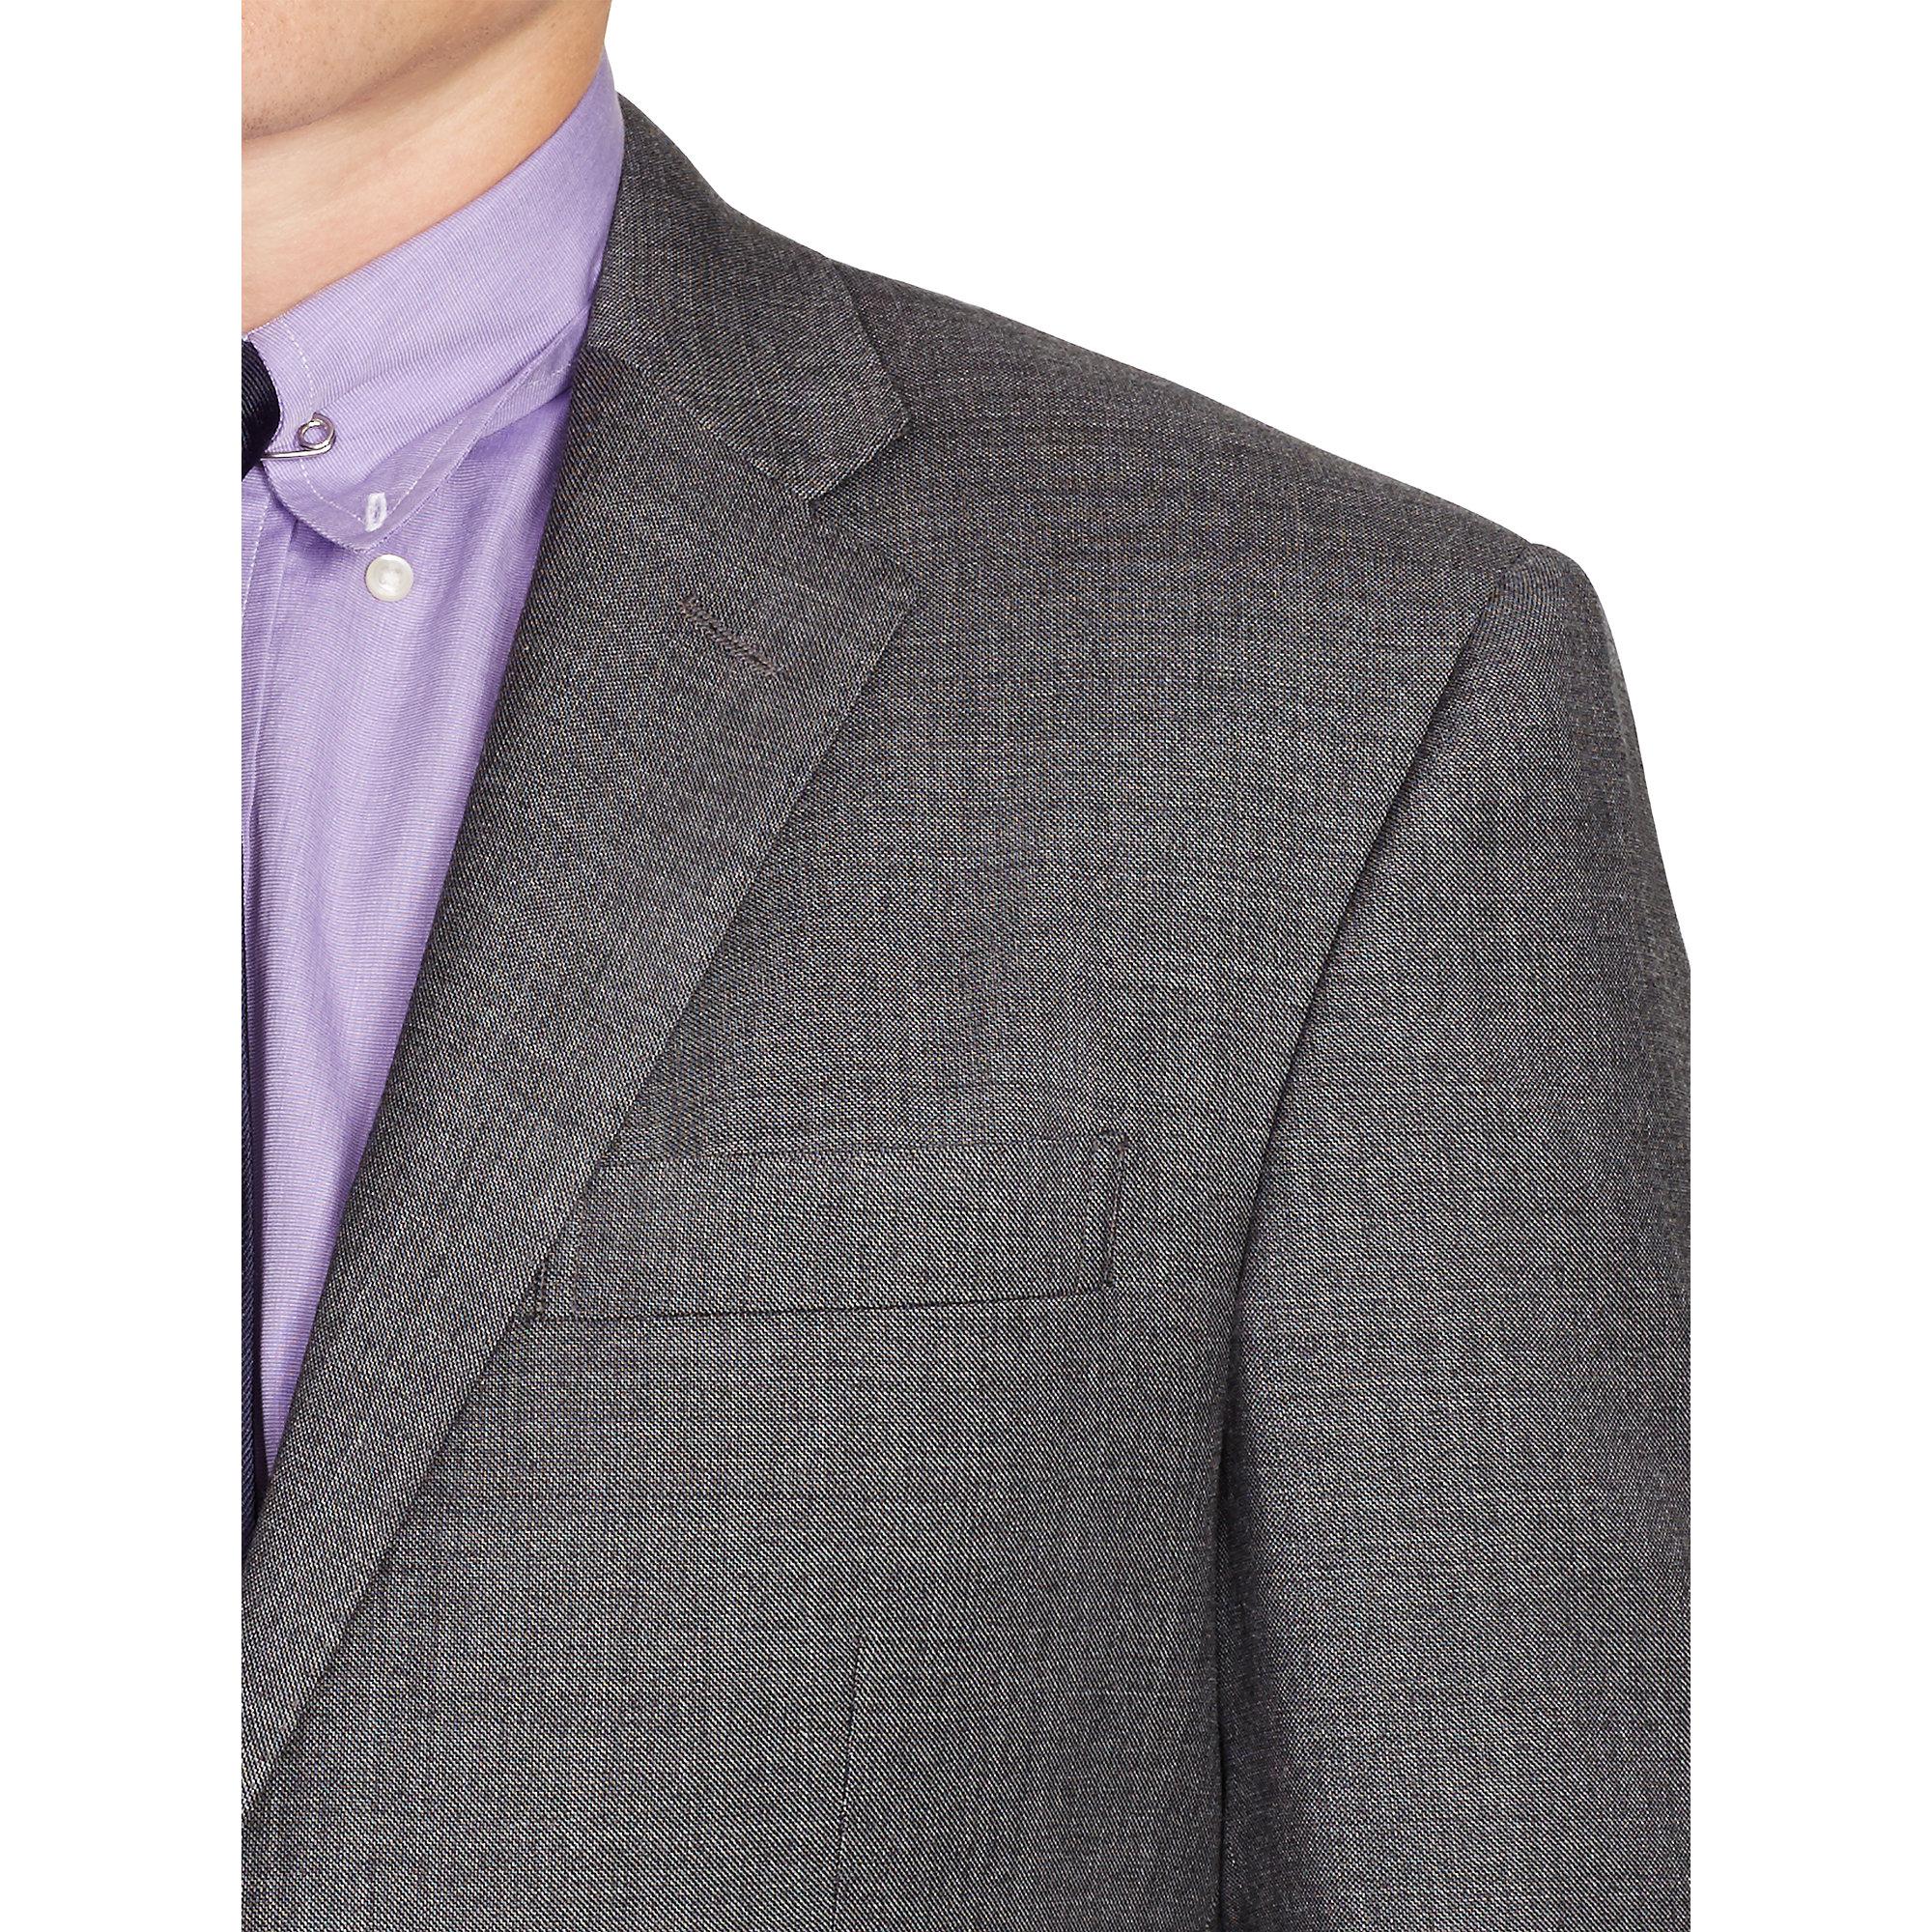 162c11cd7a Polo Ralph Lauren Gray Polo I Wool Sharkskin Suit for men